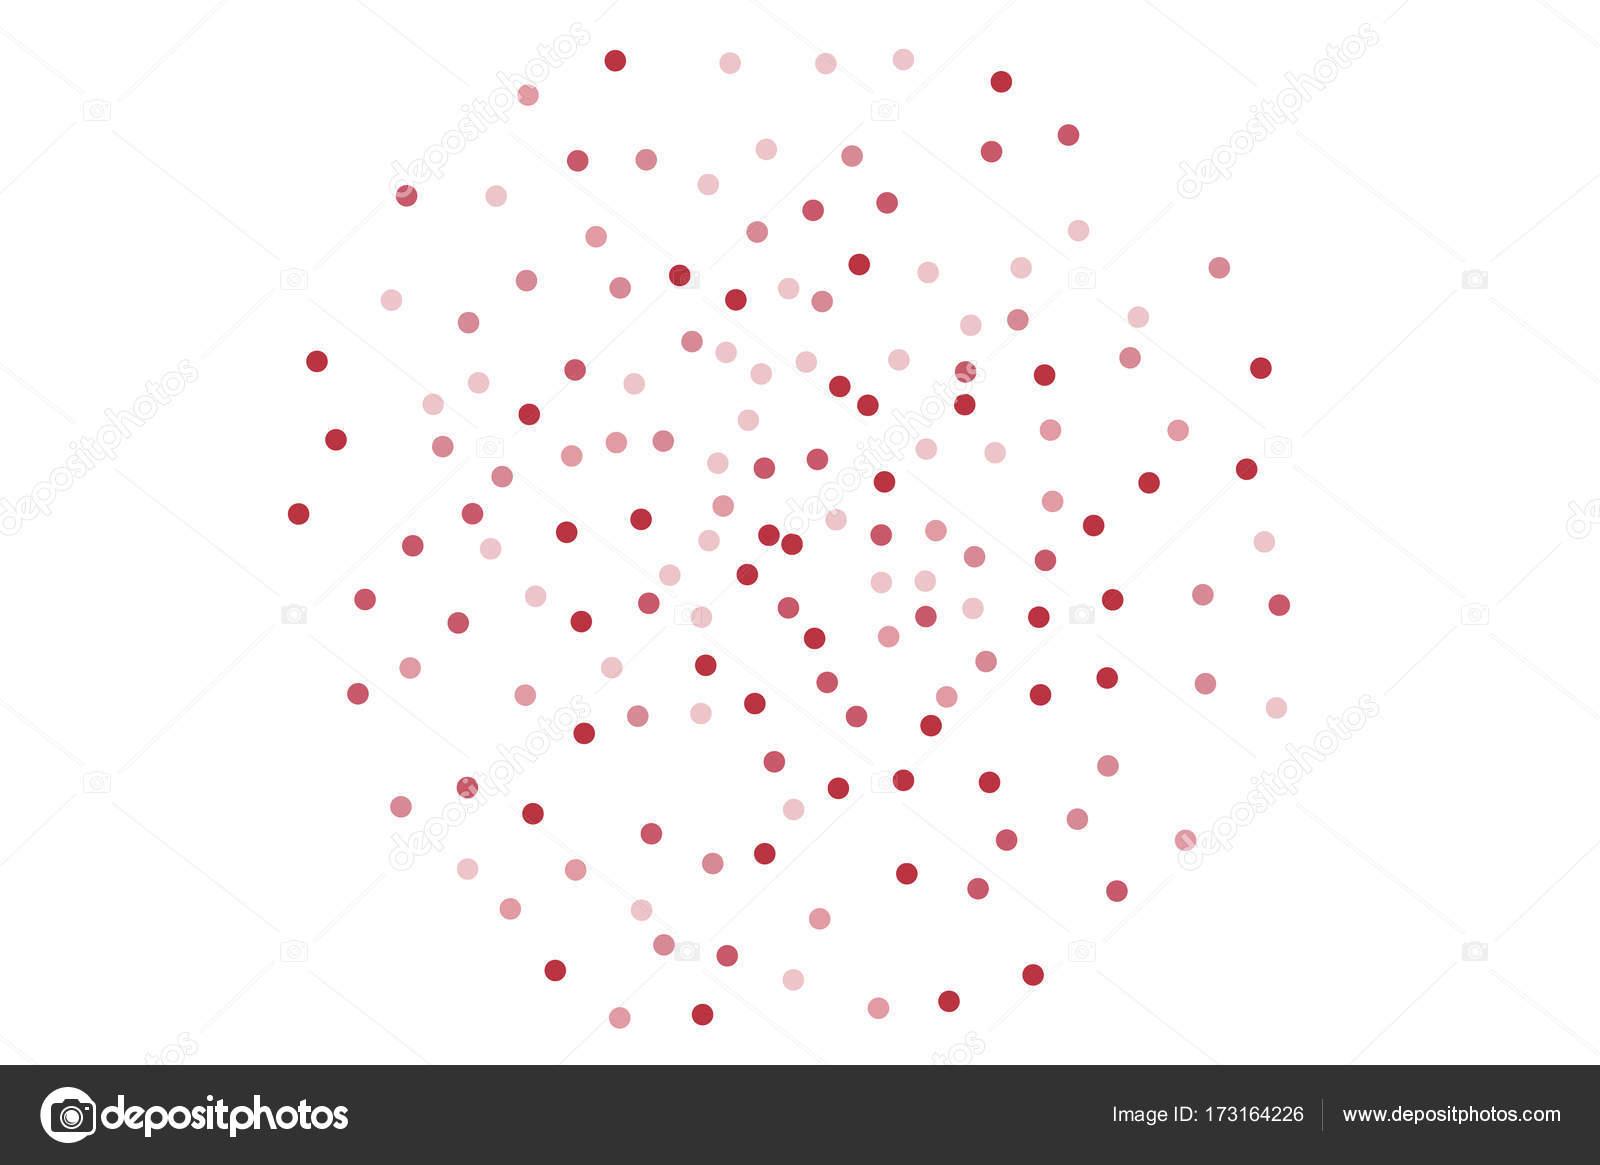 Fondo con rosa purpurina, confeti. Al azar, caóticas puntos ...